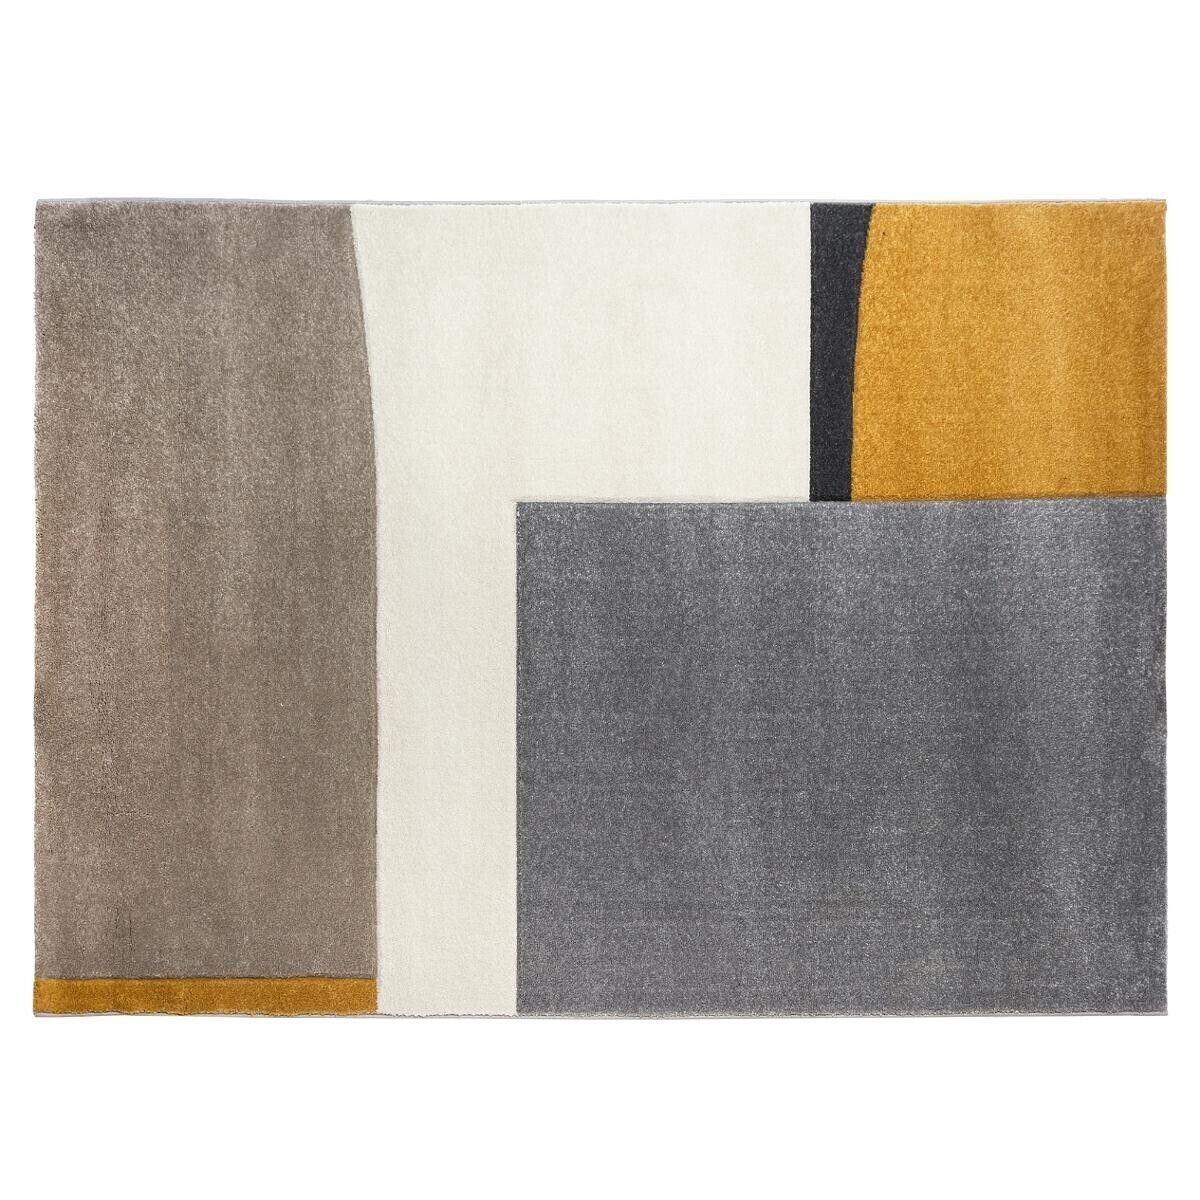 "Atmosphera Tapis ""Relief"" abstrait 160x230 cm"